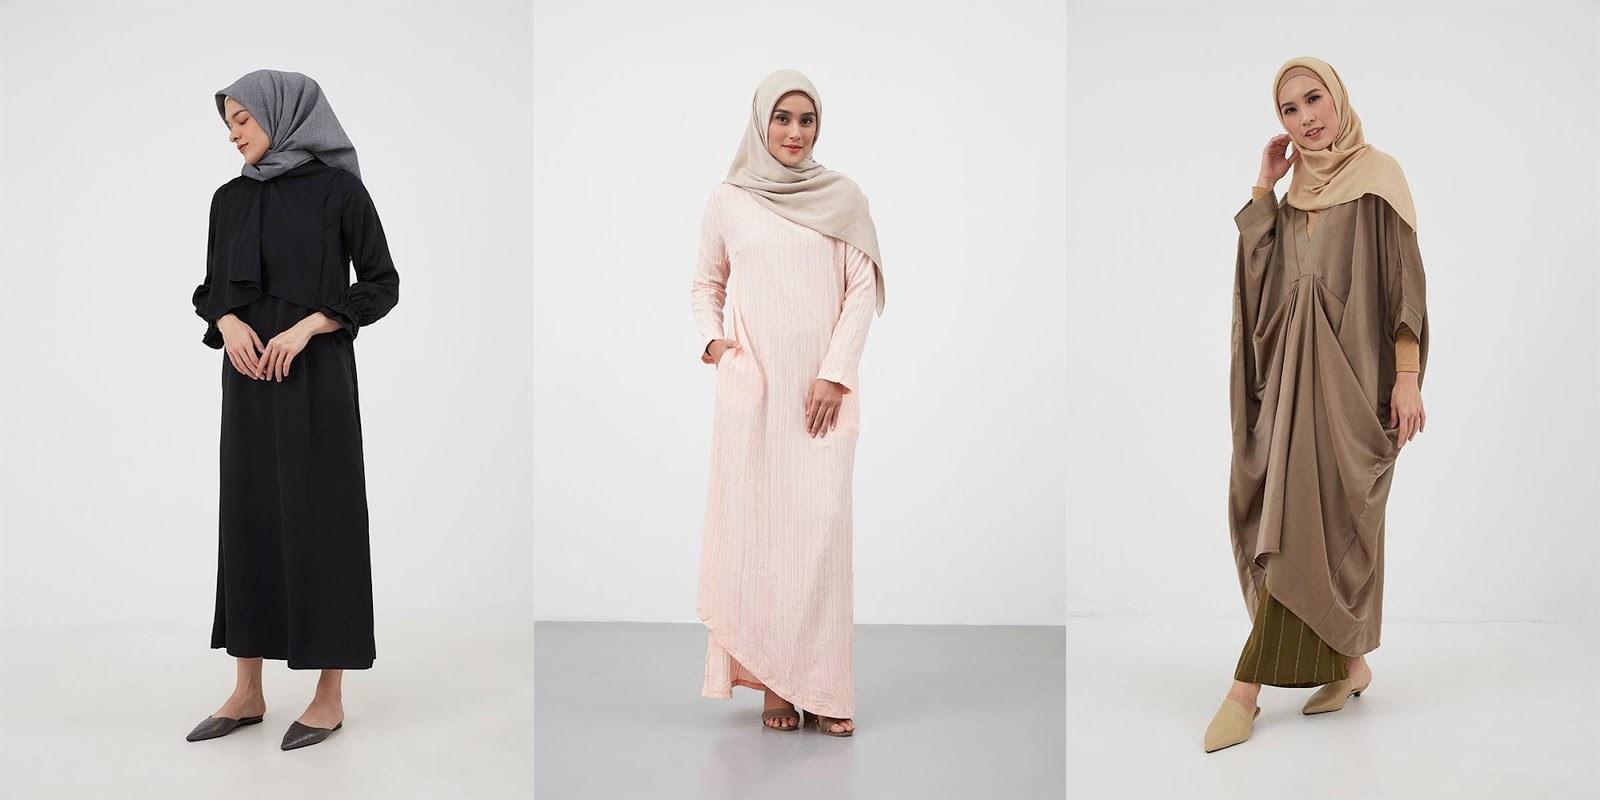 Ide Trend Baju Lebaran 2020 9fdy Intip Trend Model Baju Gamis Lebaran 2020 Dari Hijabenka